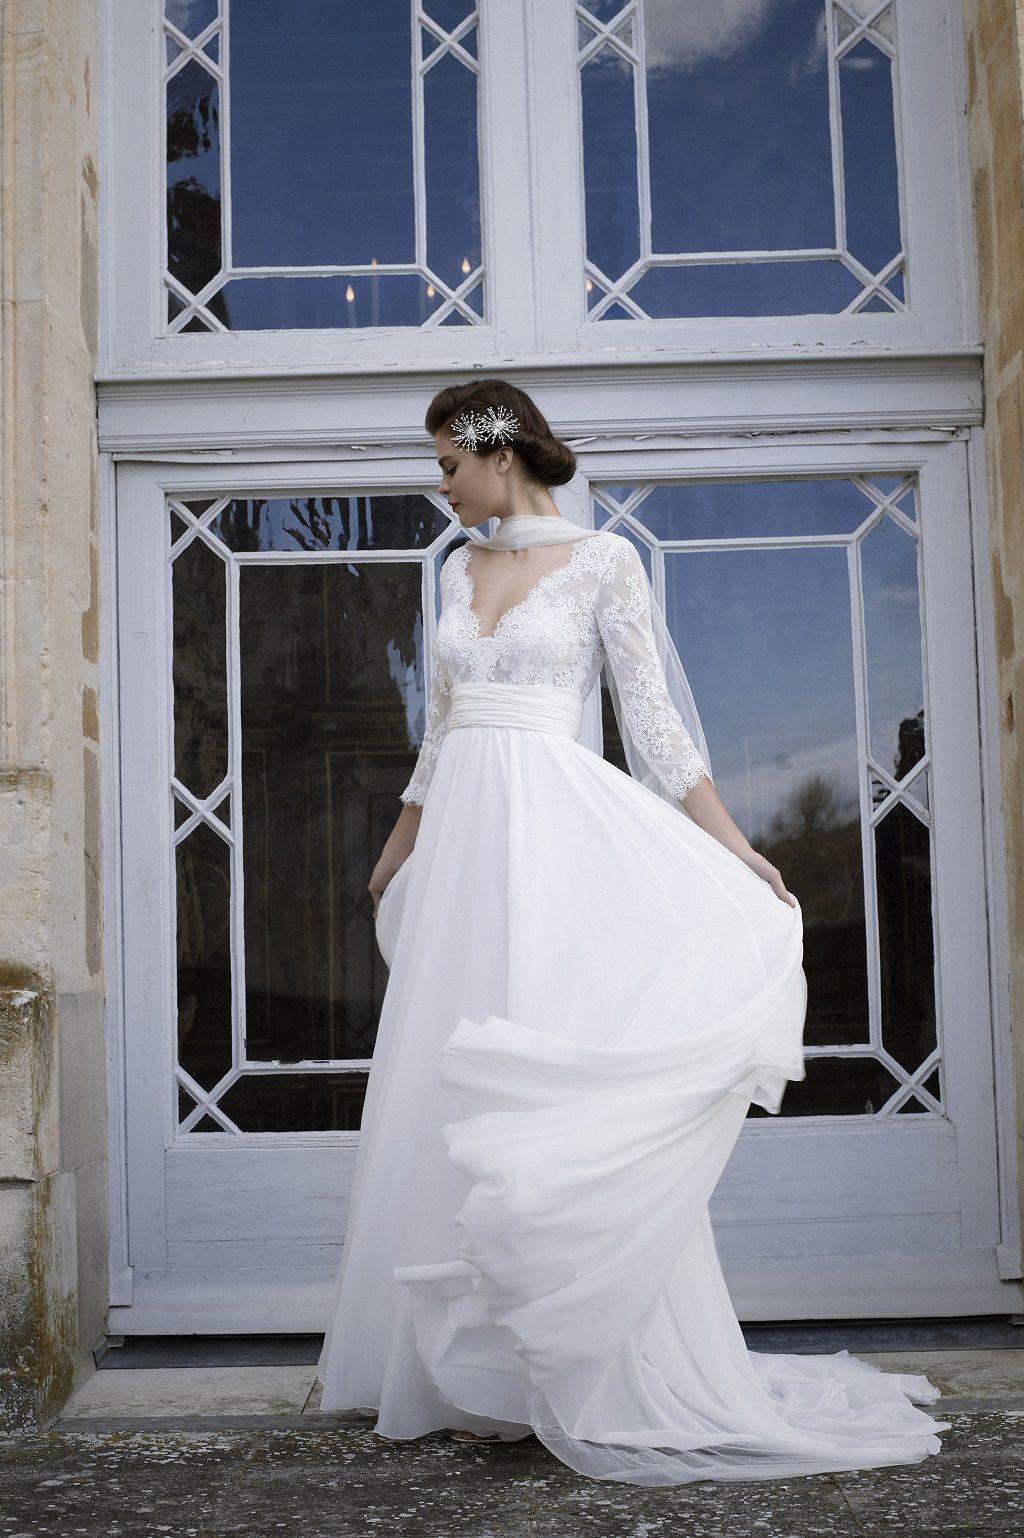 Creatrice robe mariee 3 soeurs